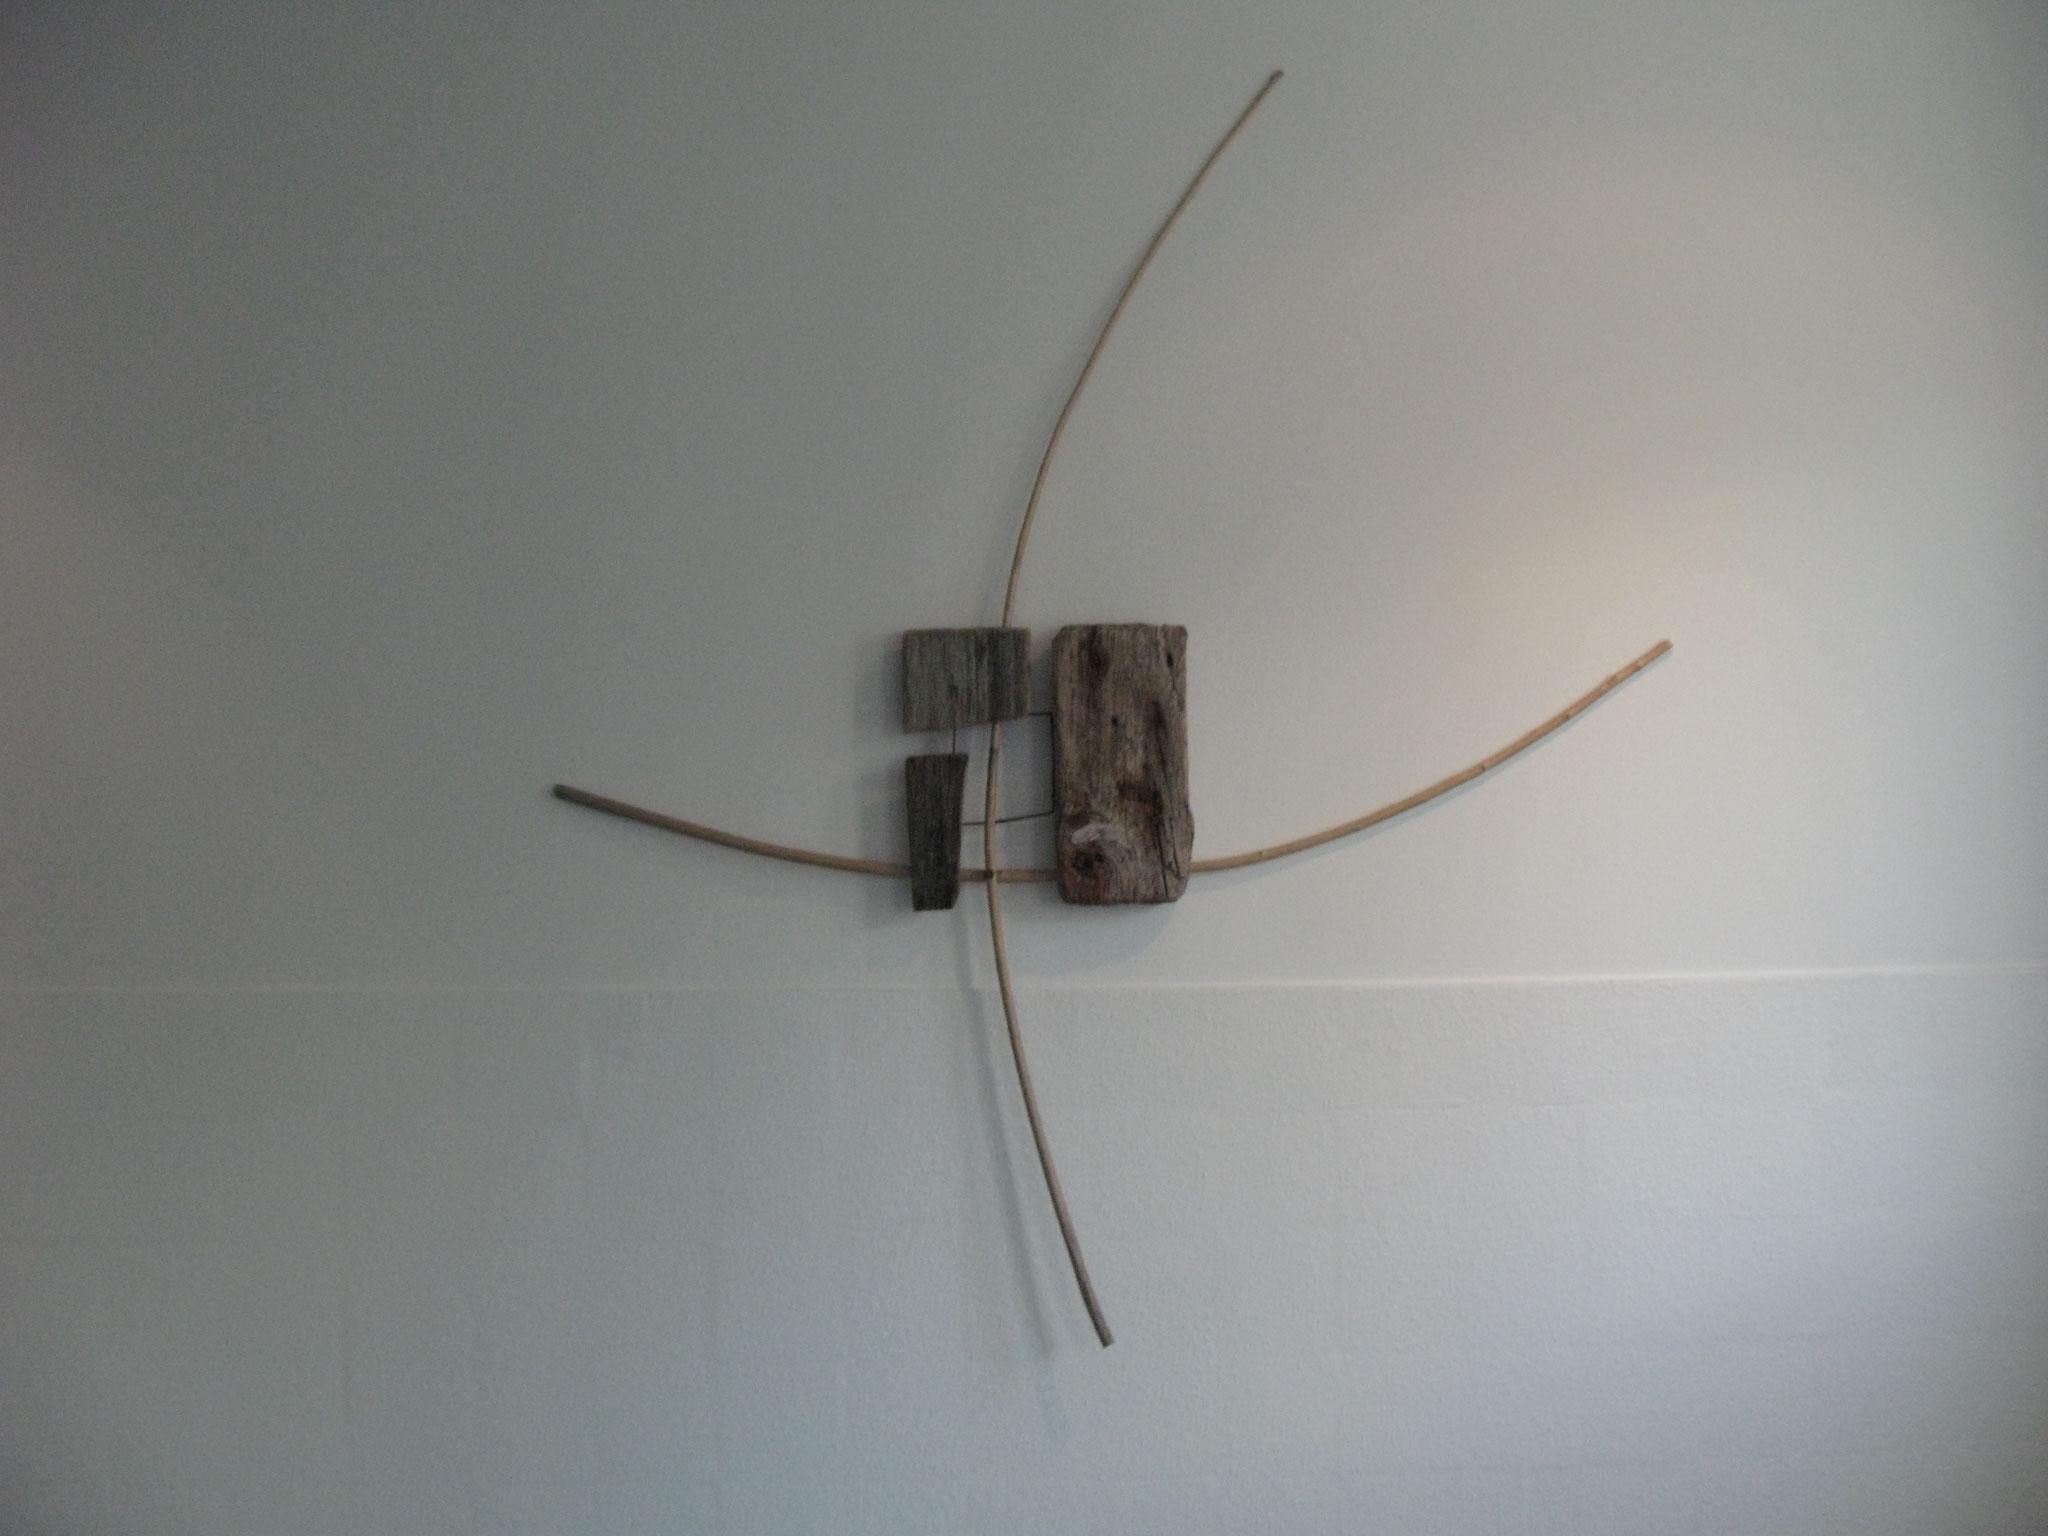 Fragmentarisches Kreuz, Kraftobjekte Wolfgang Wallner Hall in Tirol